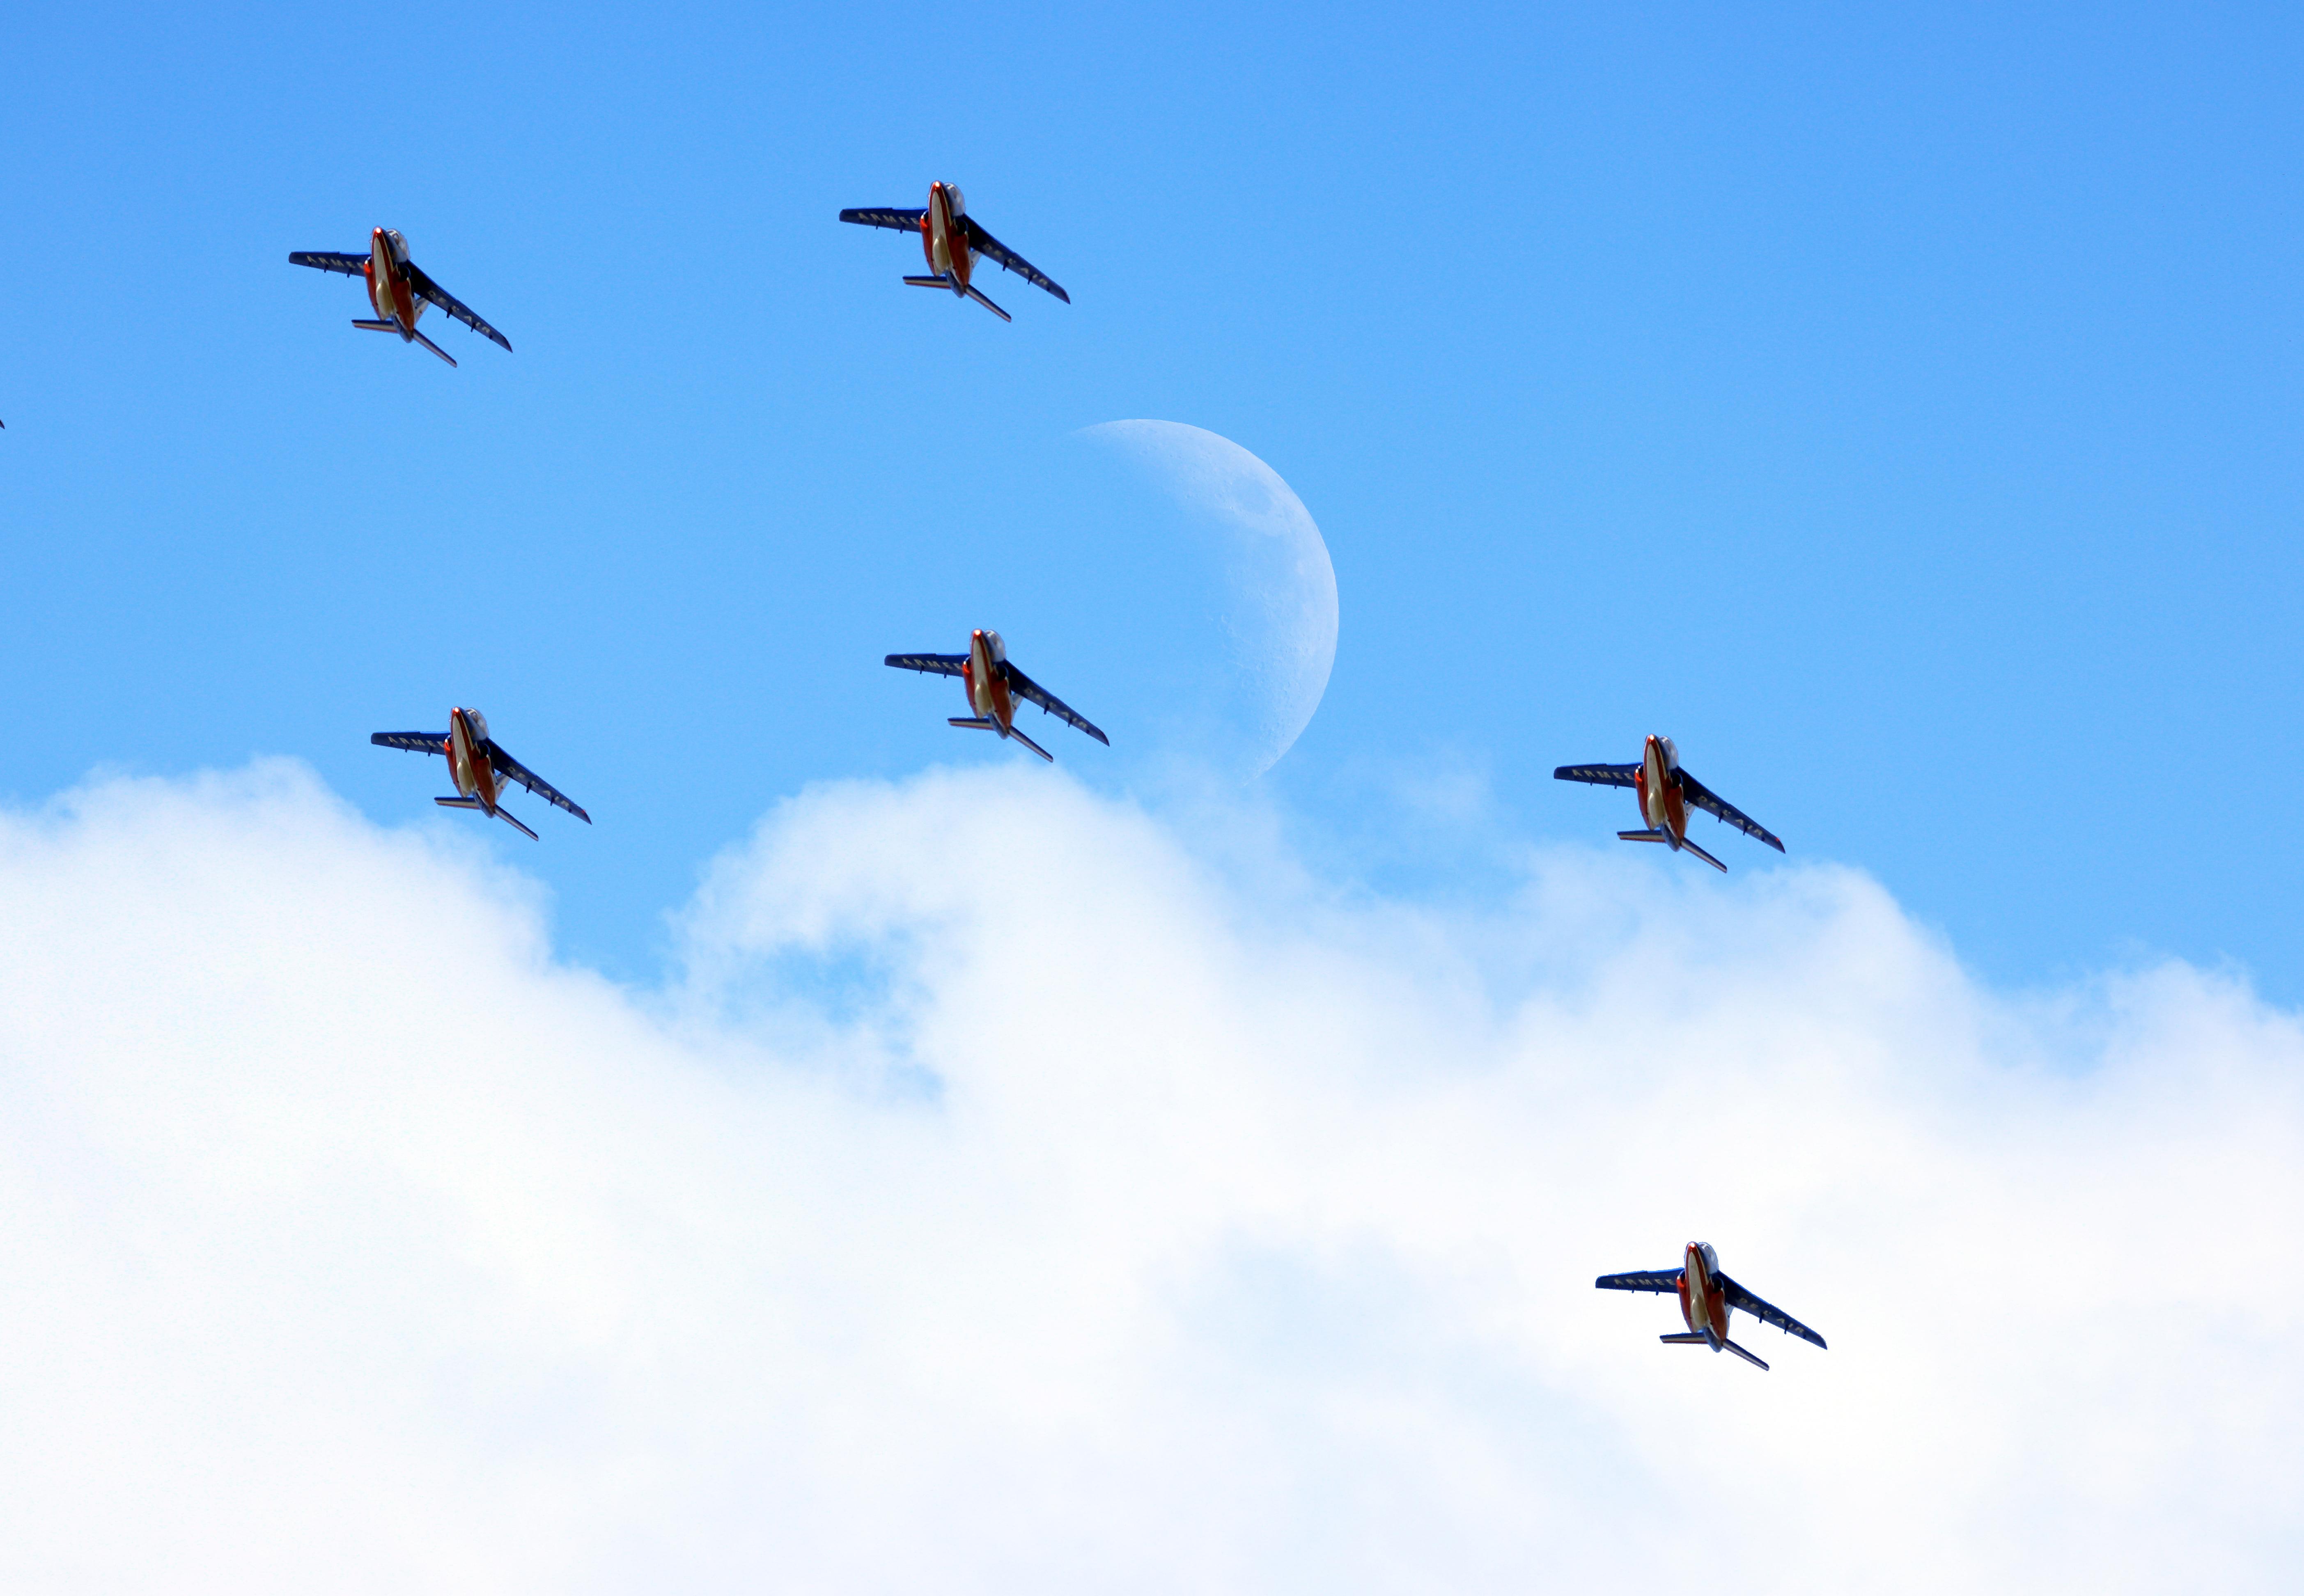 Lune nuage jets